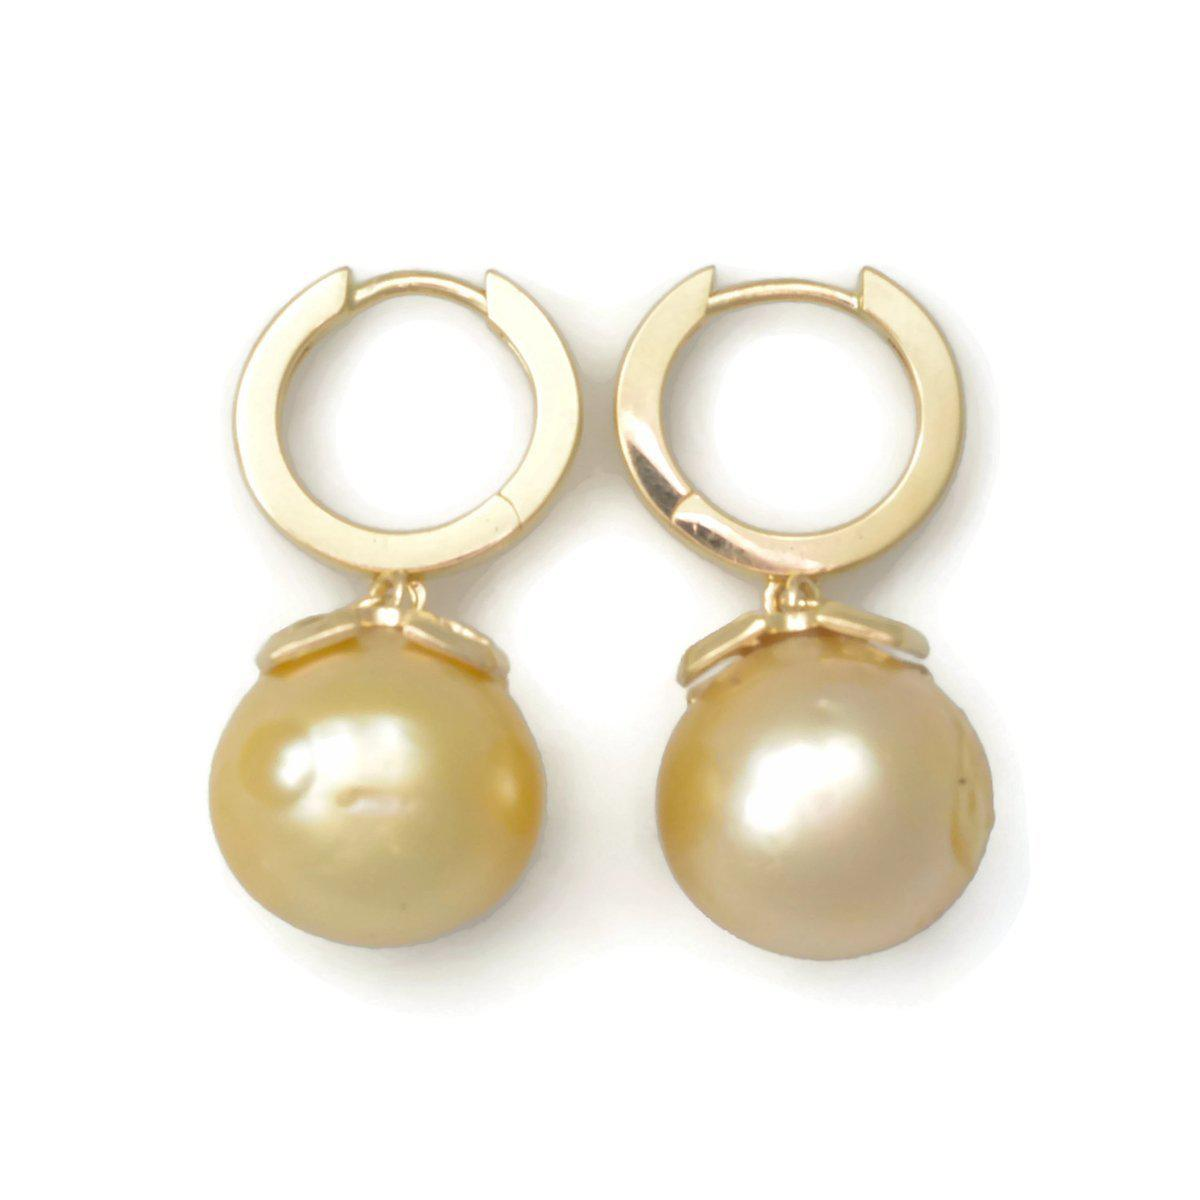 Donna Pizarro Designs 18kt South Sea Pearl Drop Earrings D8qv6dE4